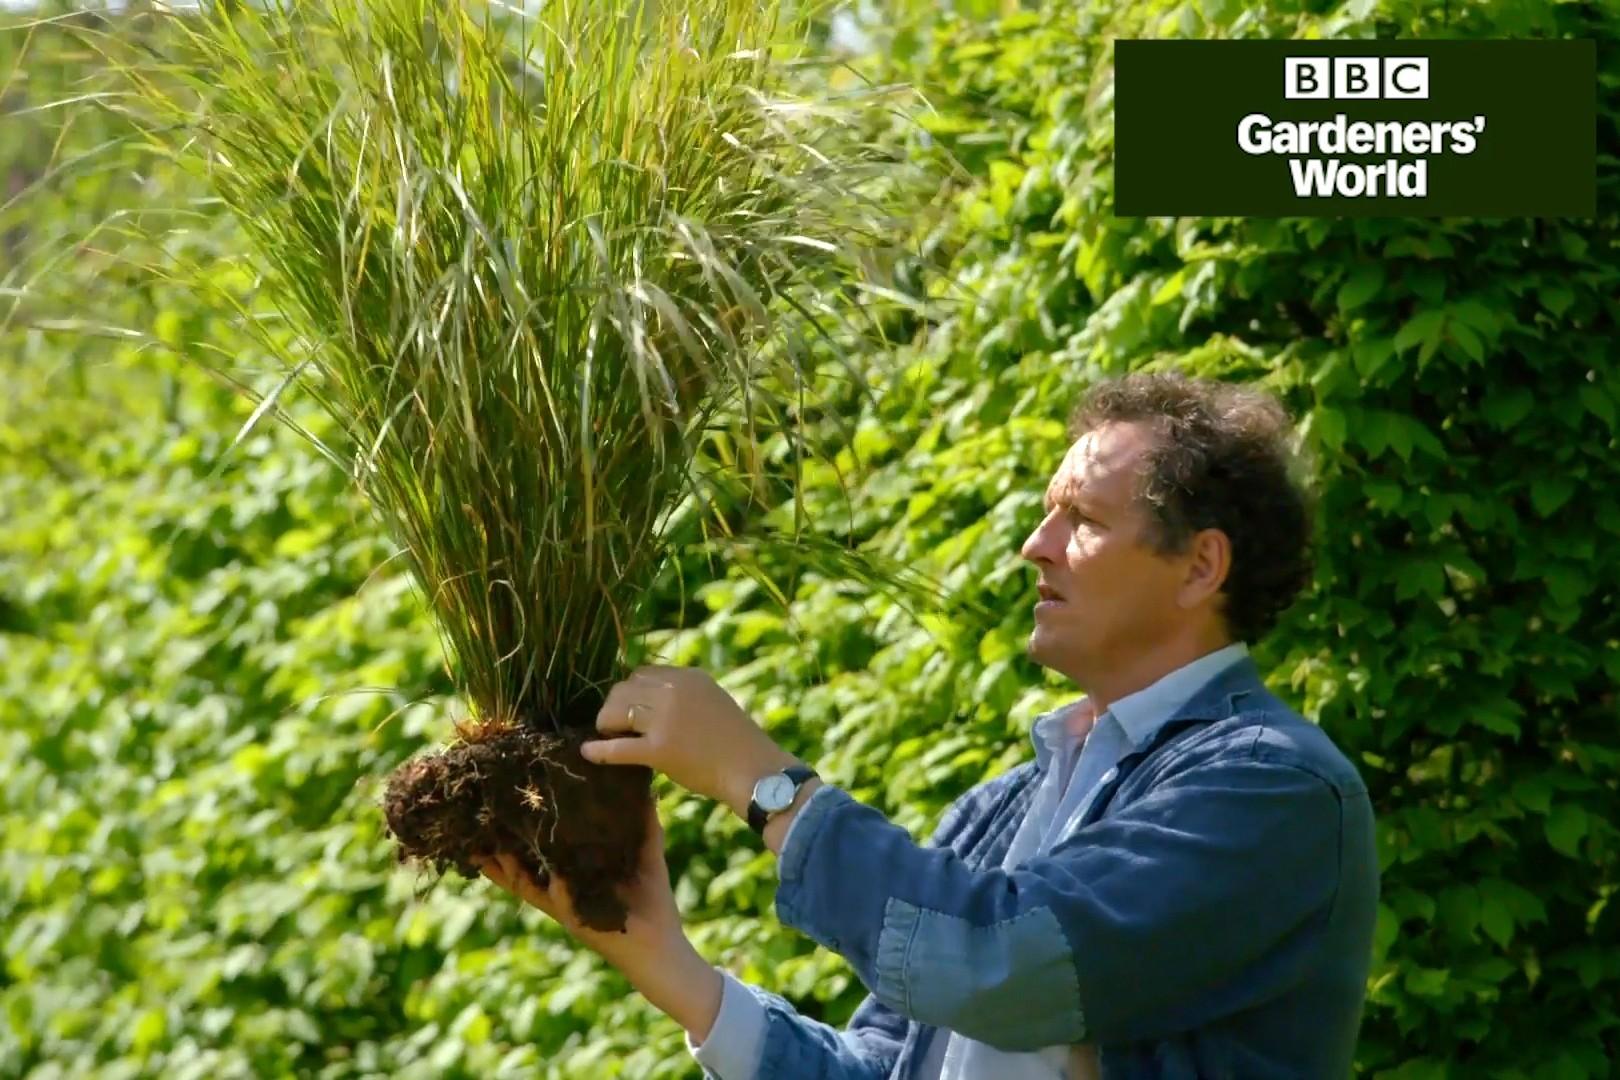 Monty Don transplanting pheasant grass